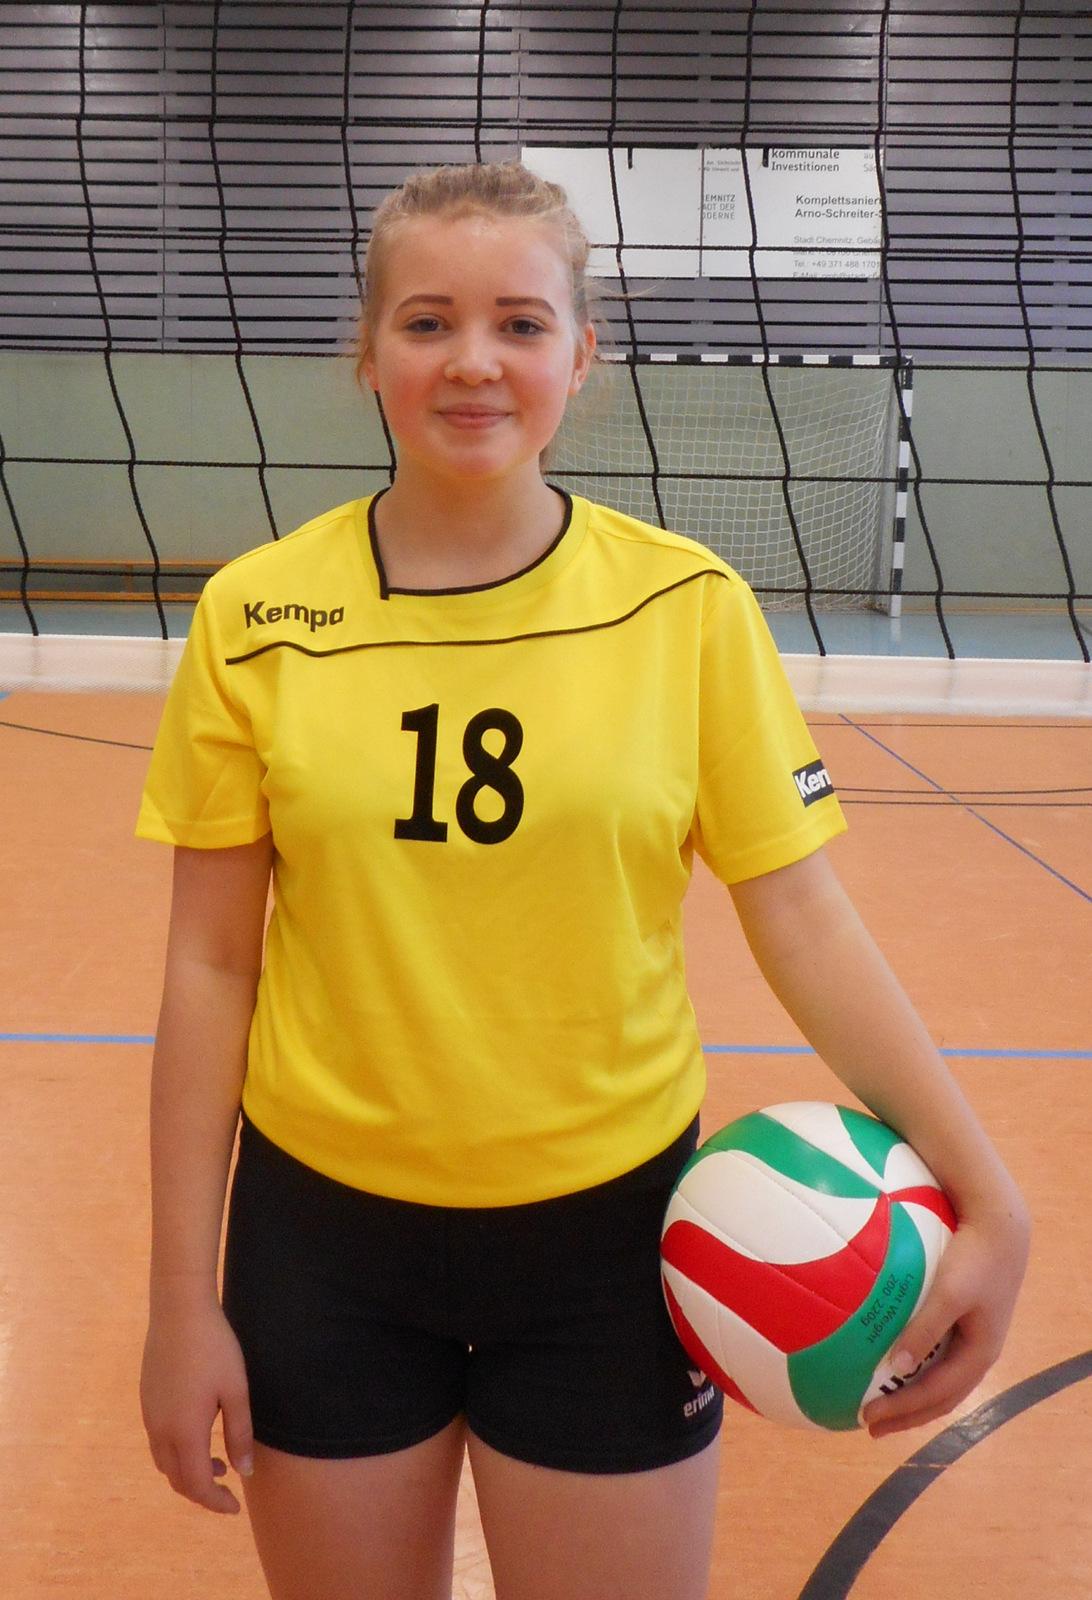 Gina Großmann